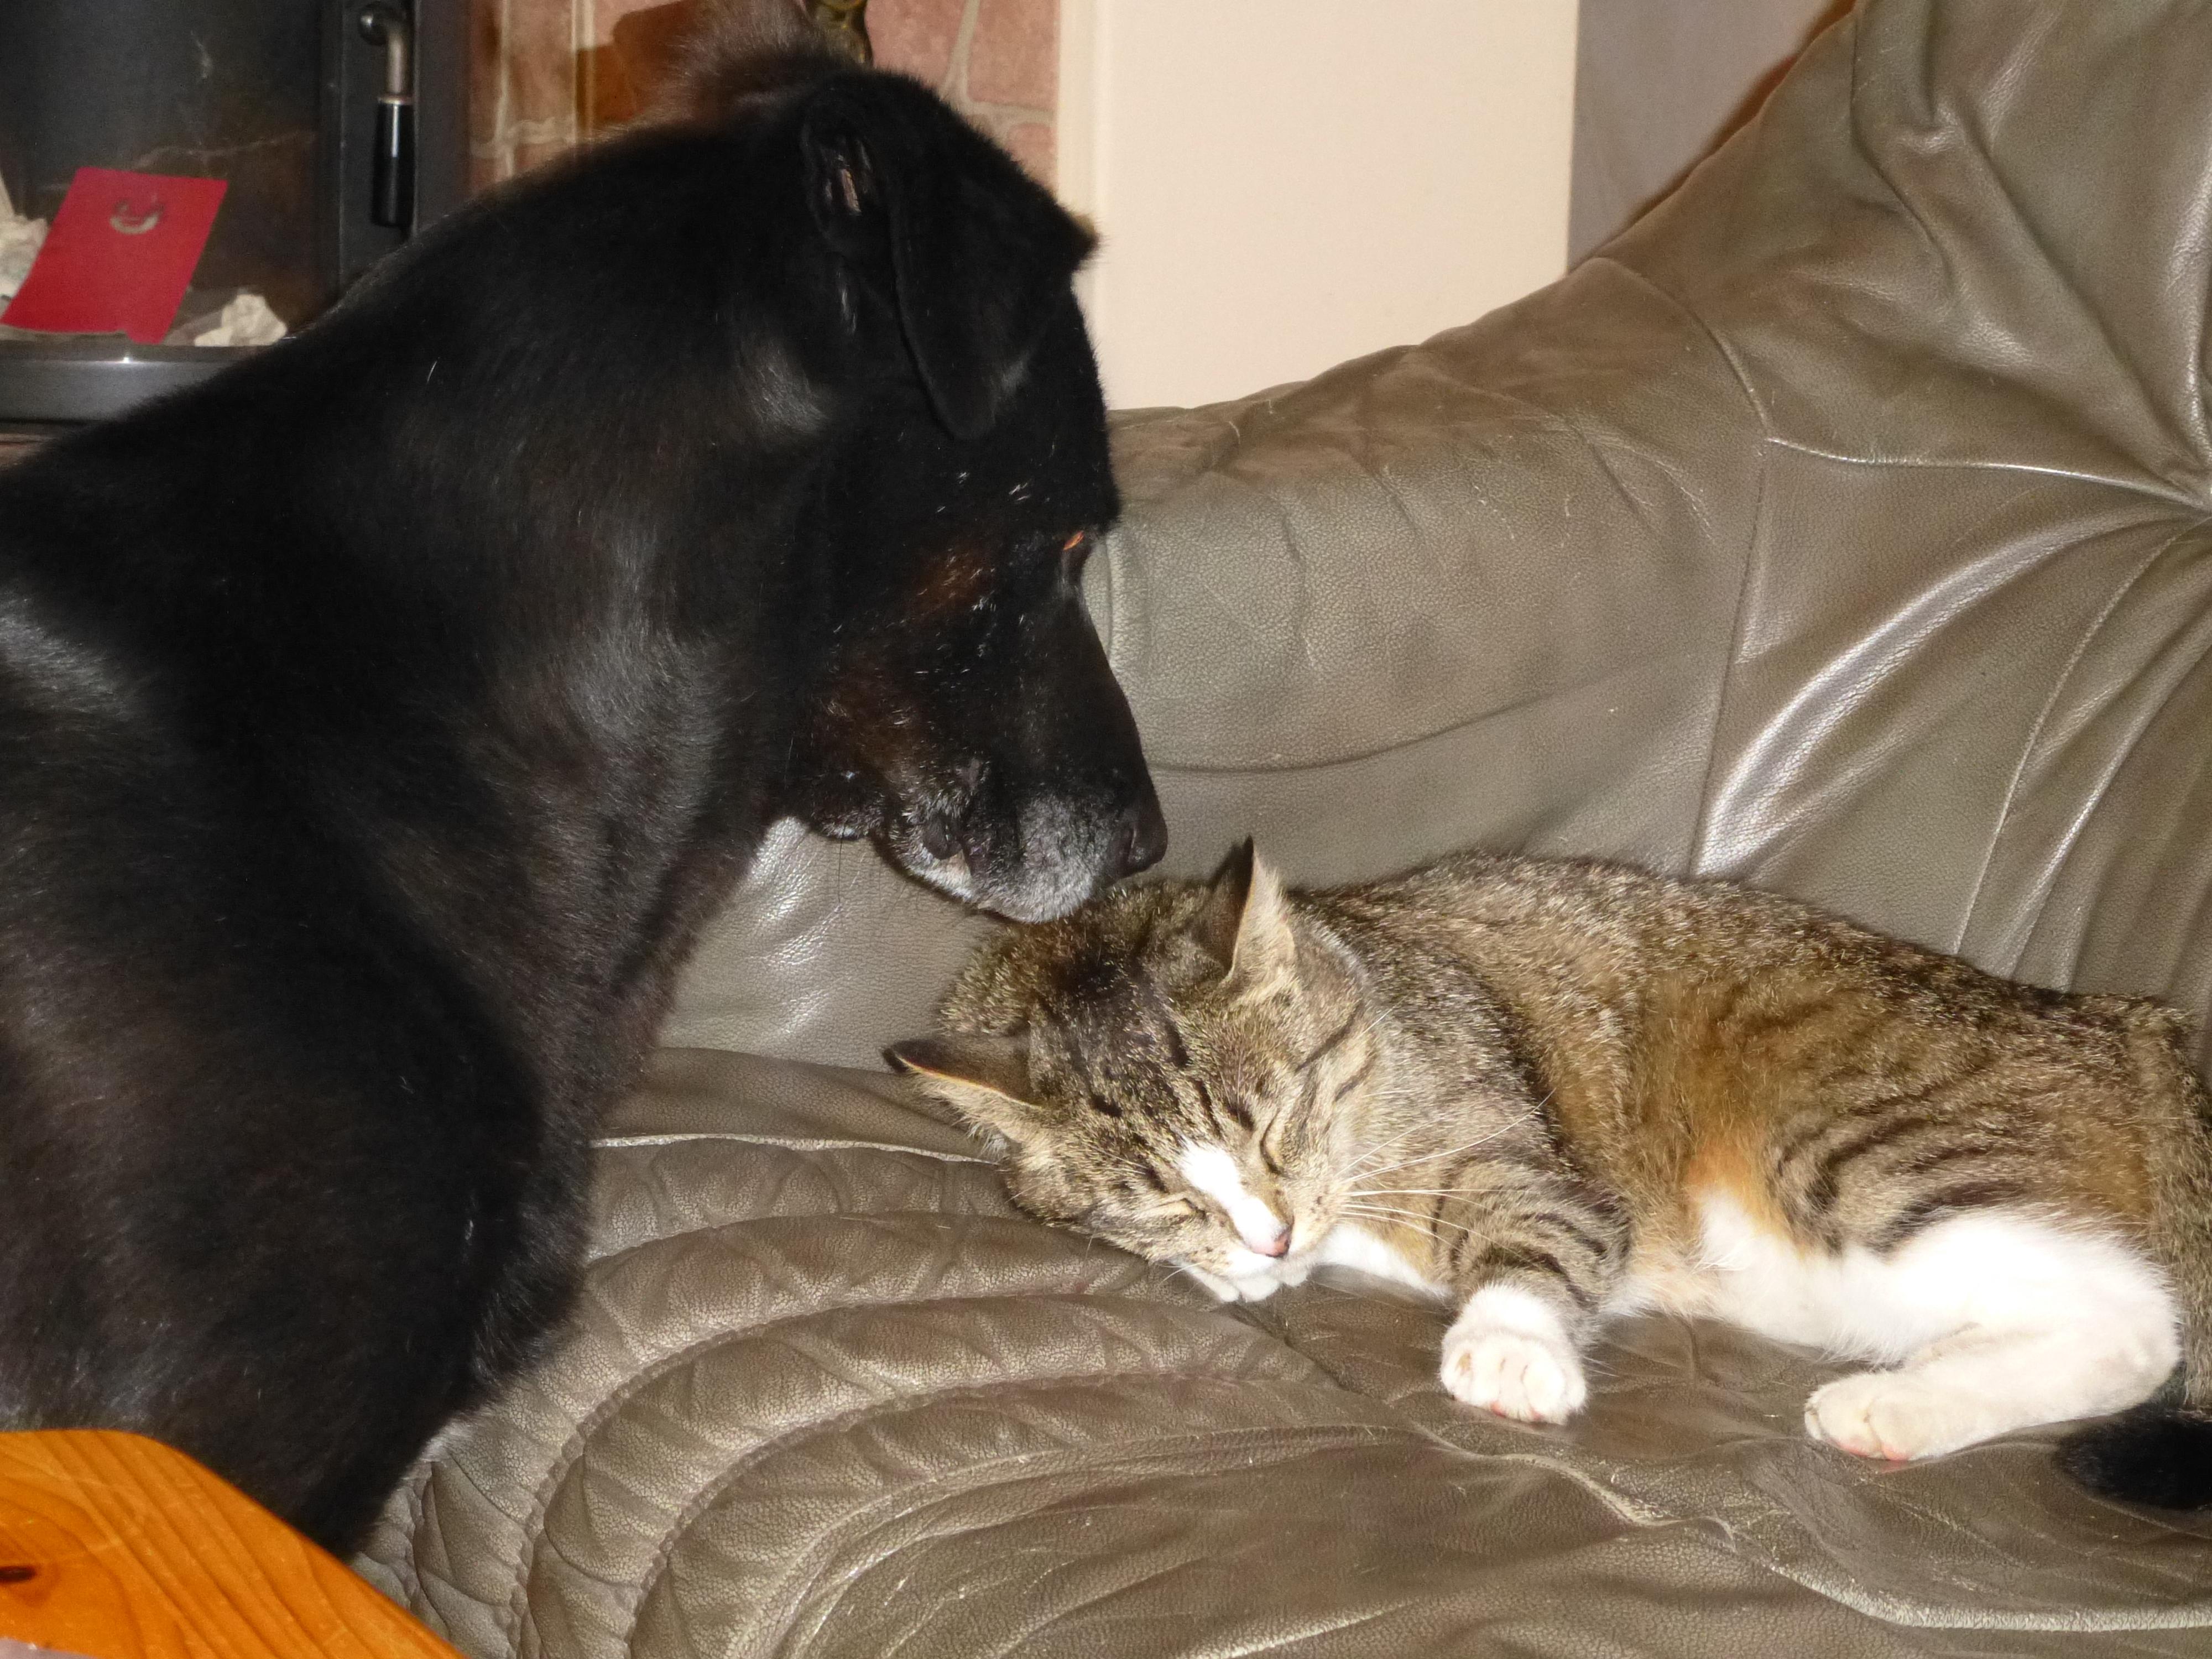 Hili and Cyrus lick